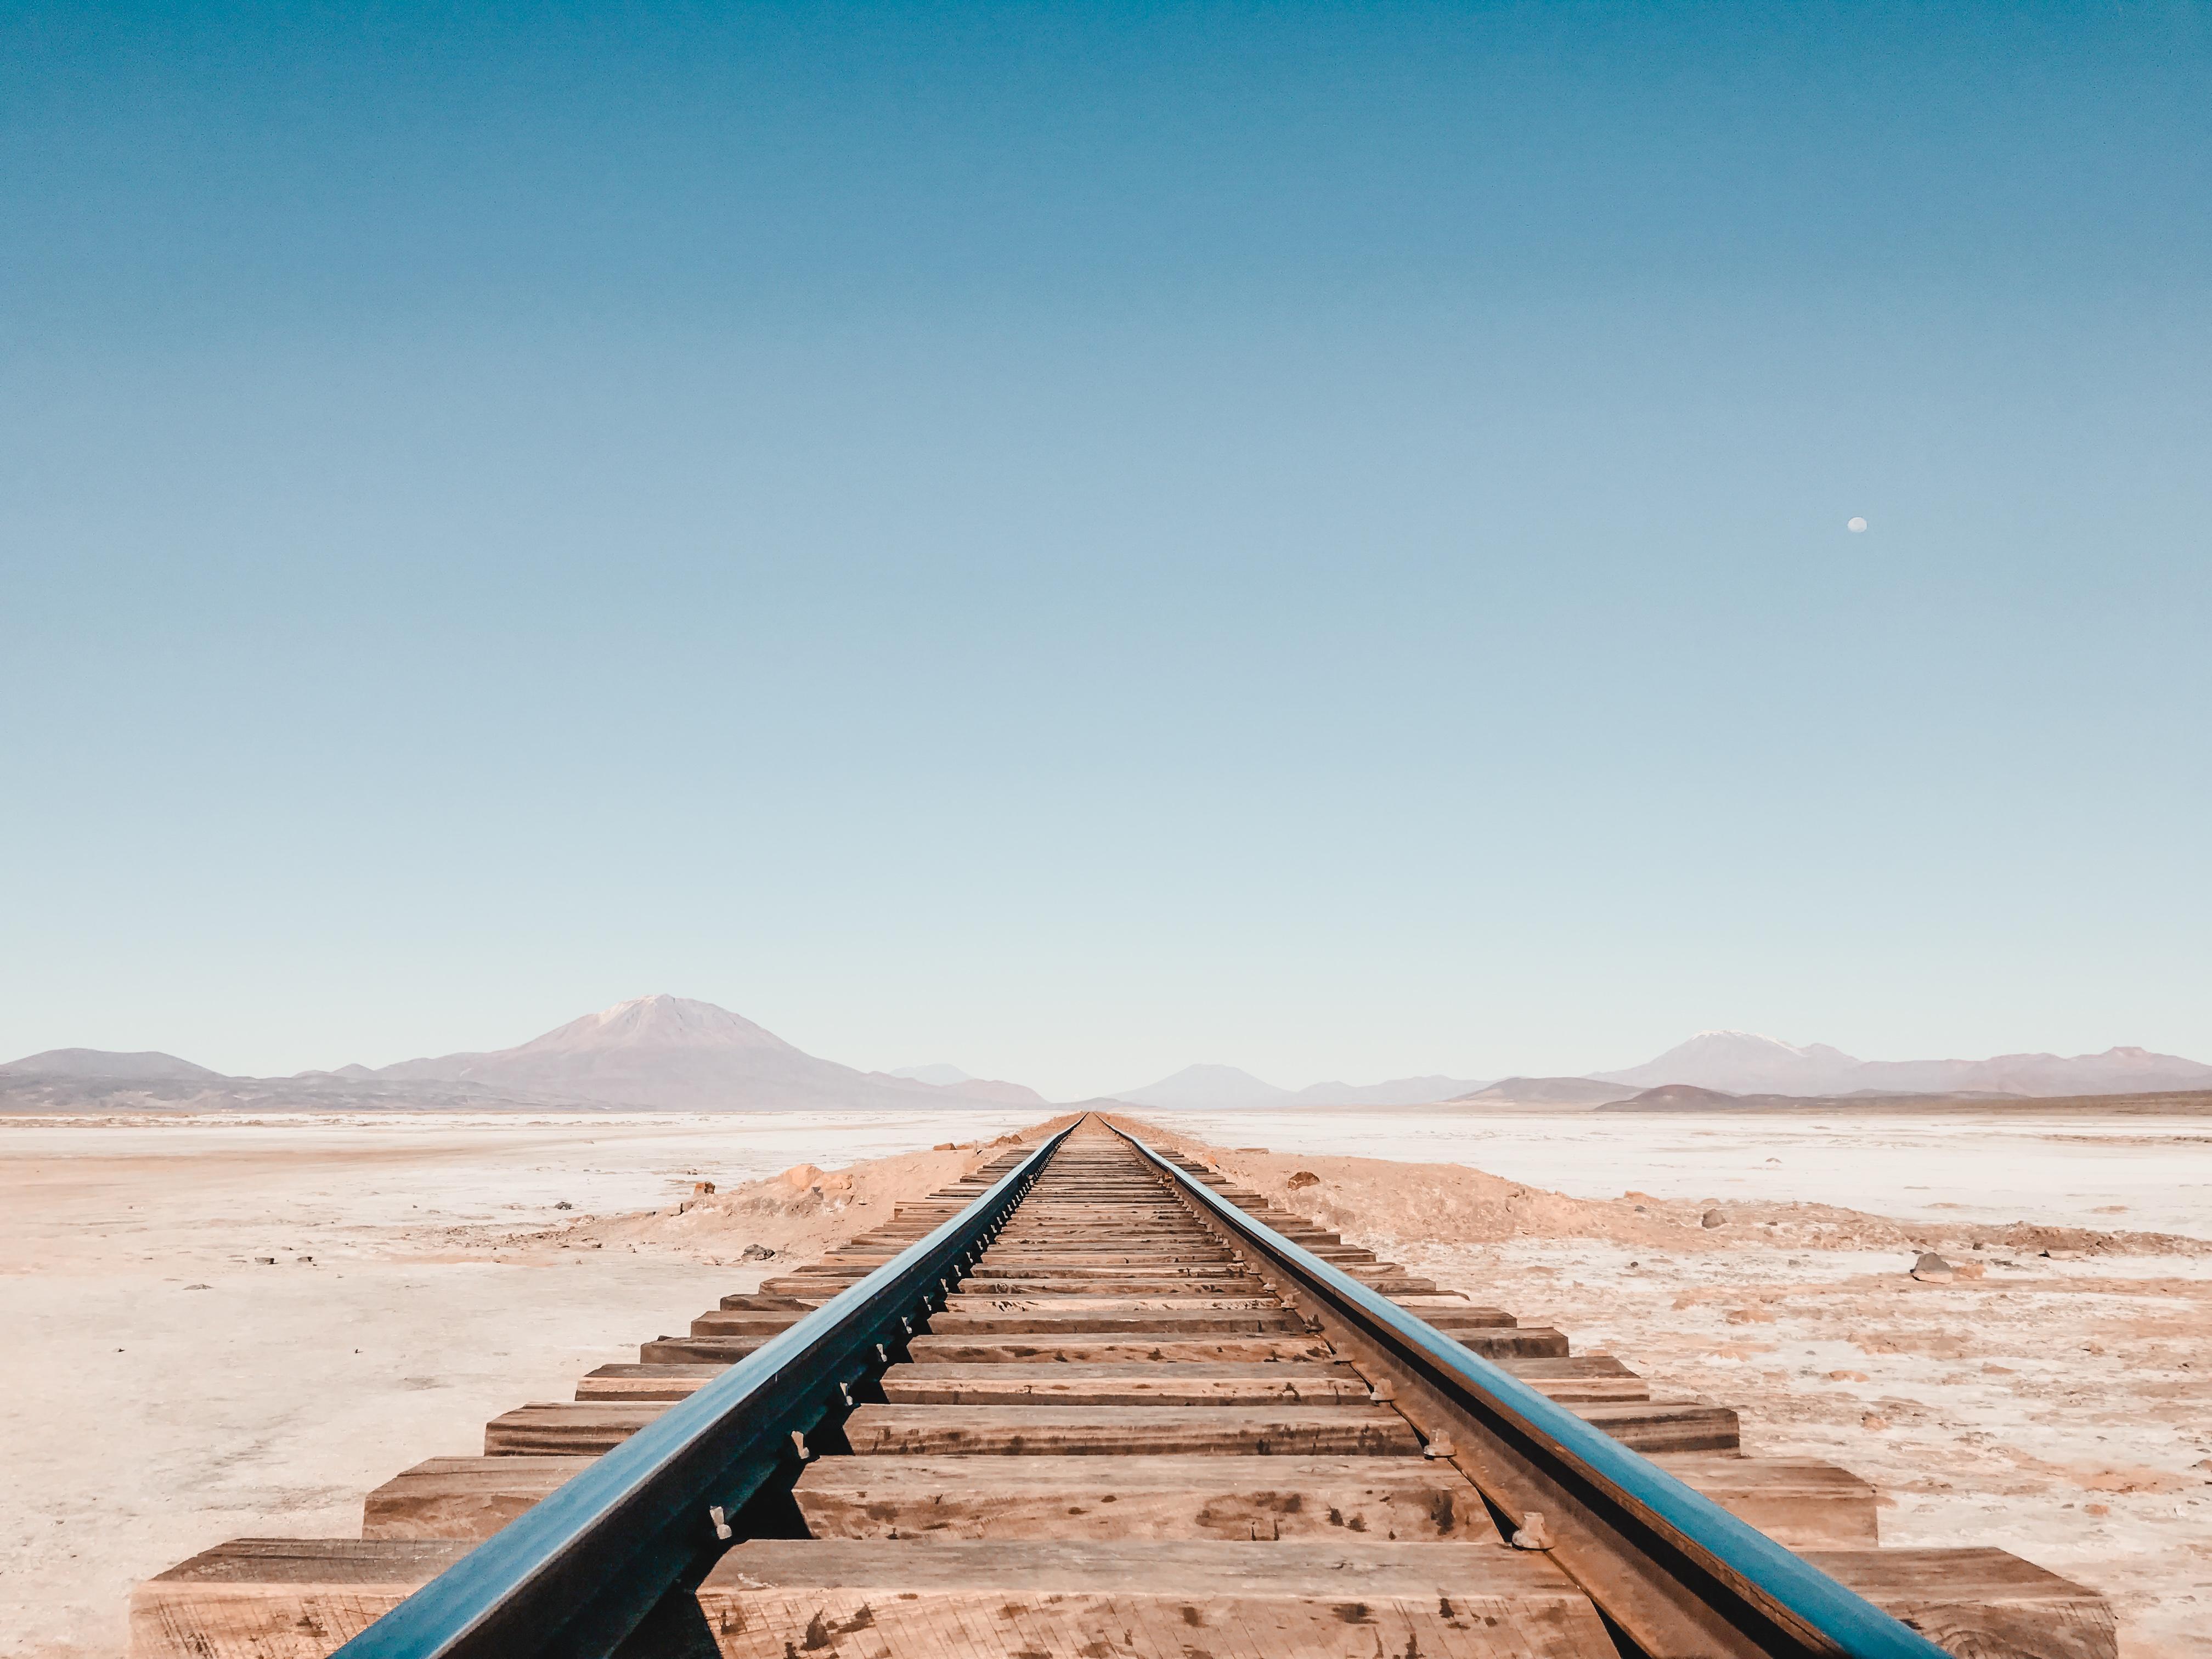 abandoned train track in the desert